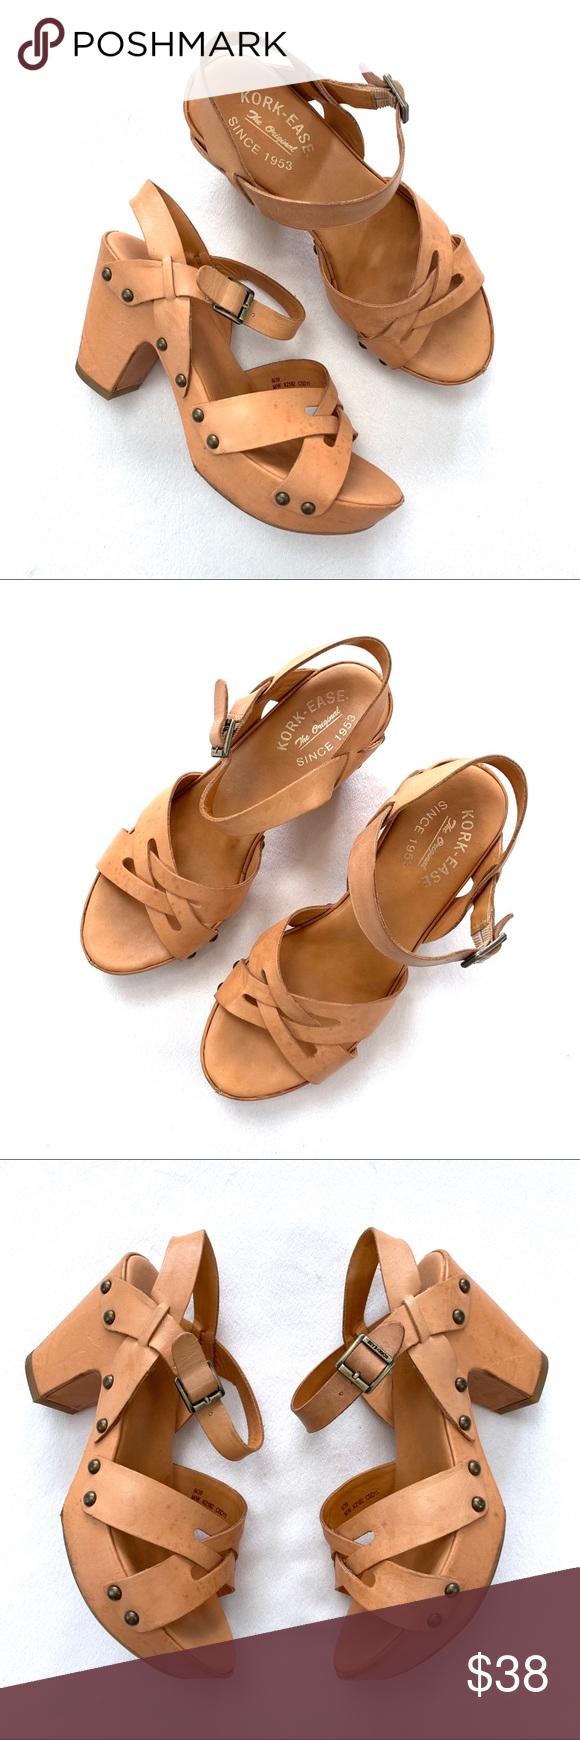 237e92678530 Kork-Ease Deborah K2182 Sandals Has some wear. Pls see all the photos.